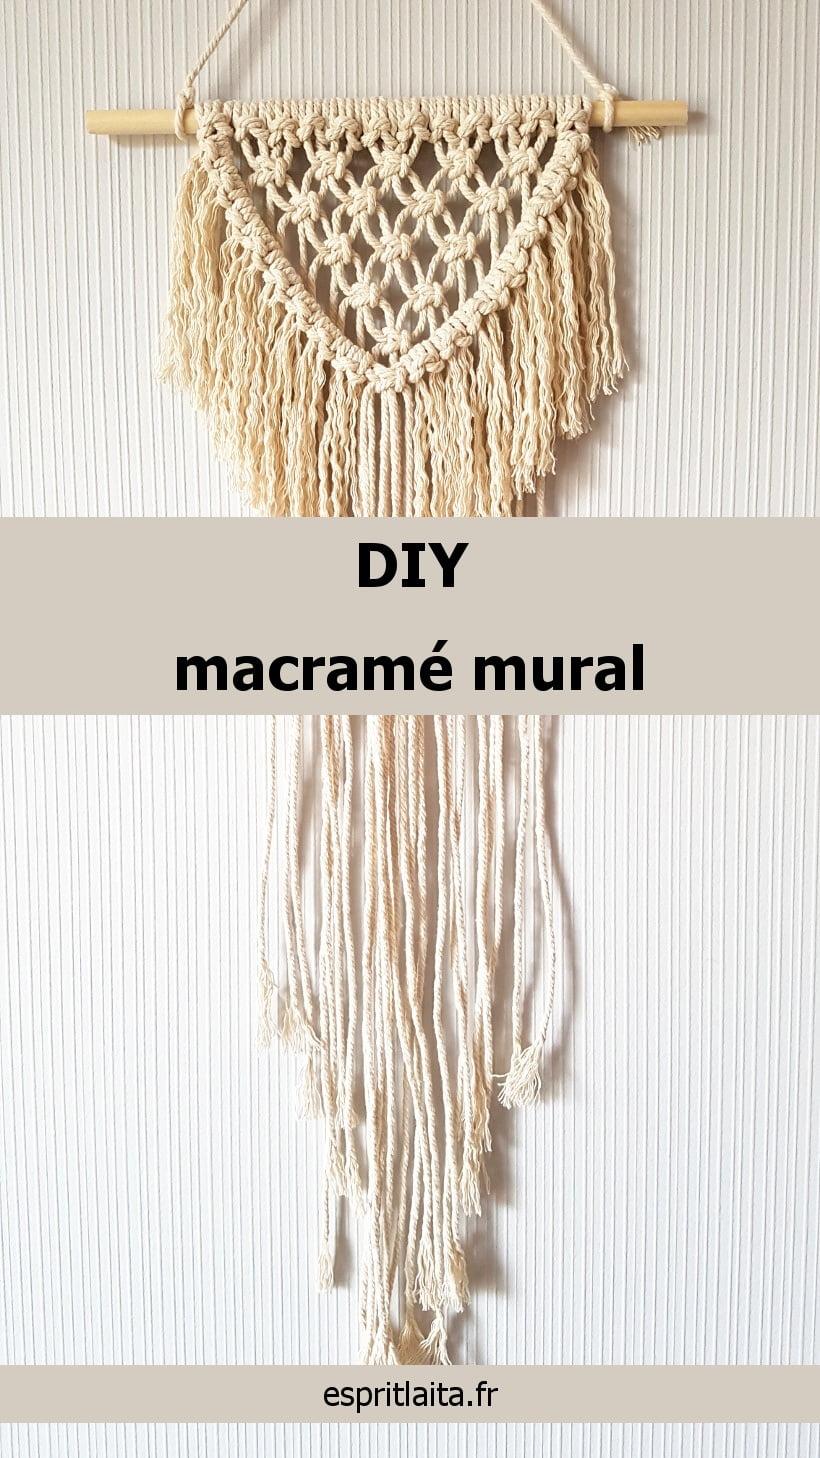 DIY wall hanging - Tuto macramé mural facile débutant